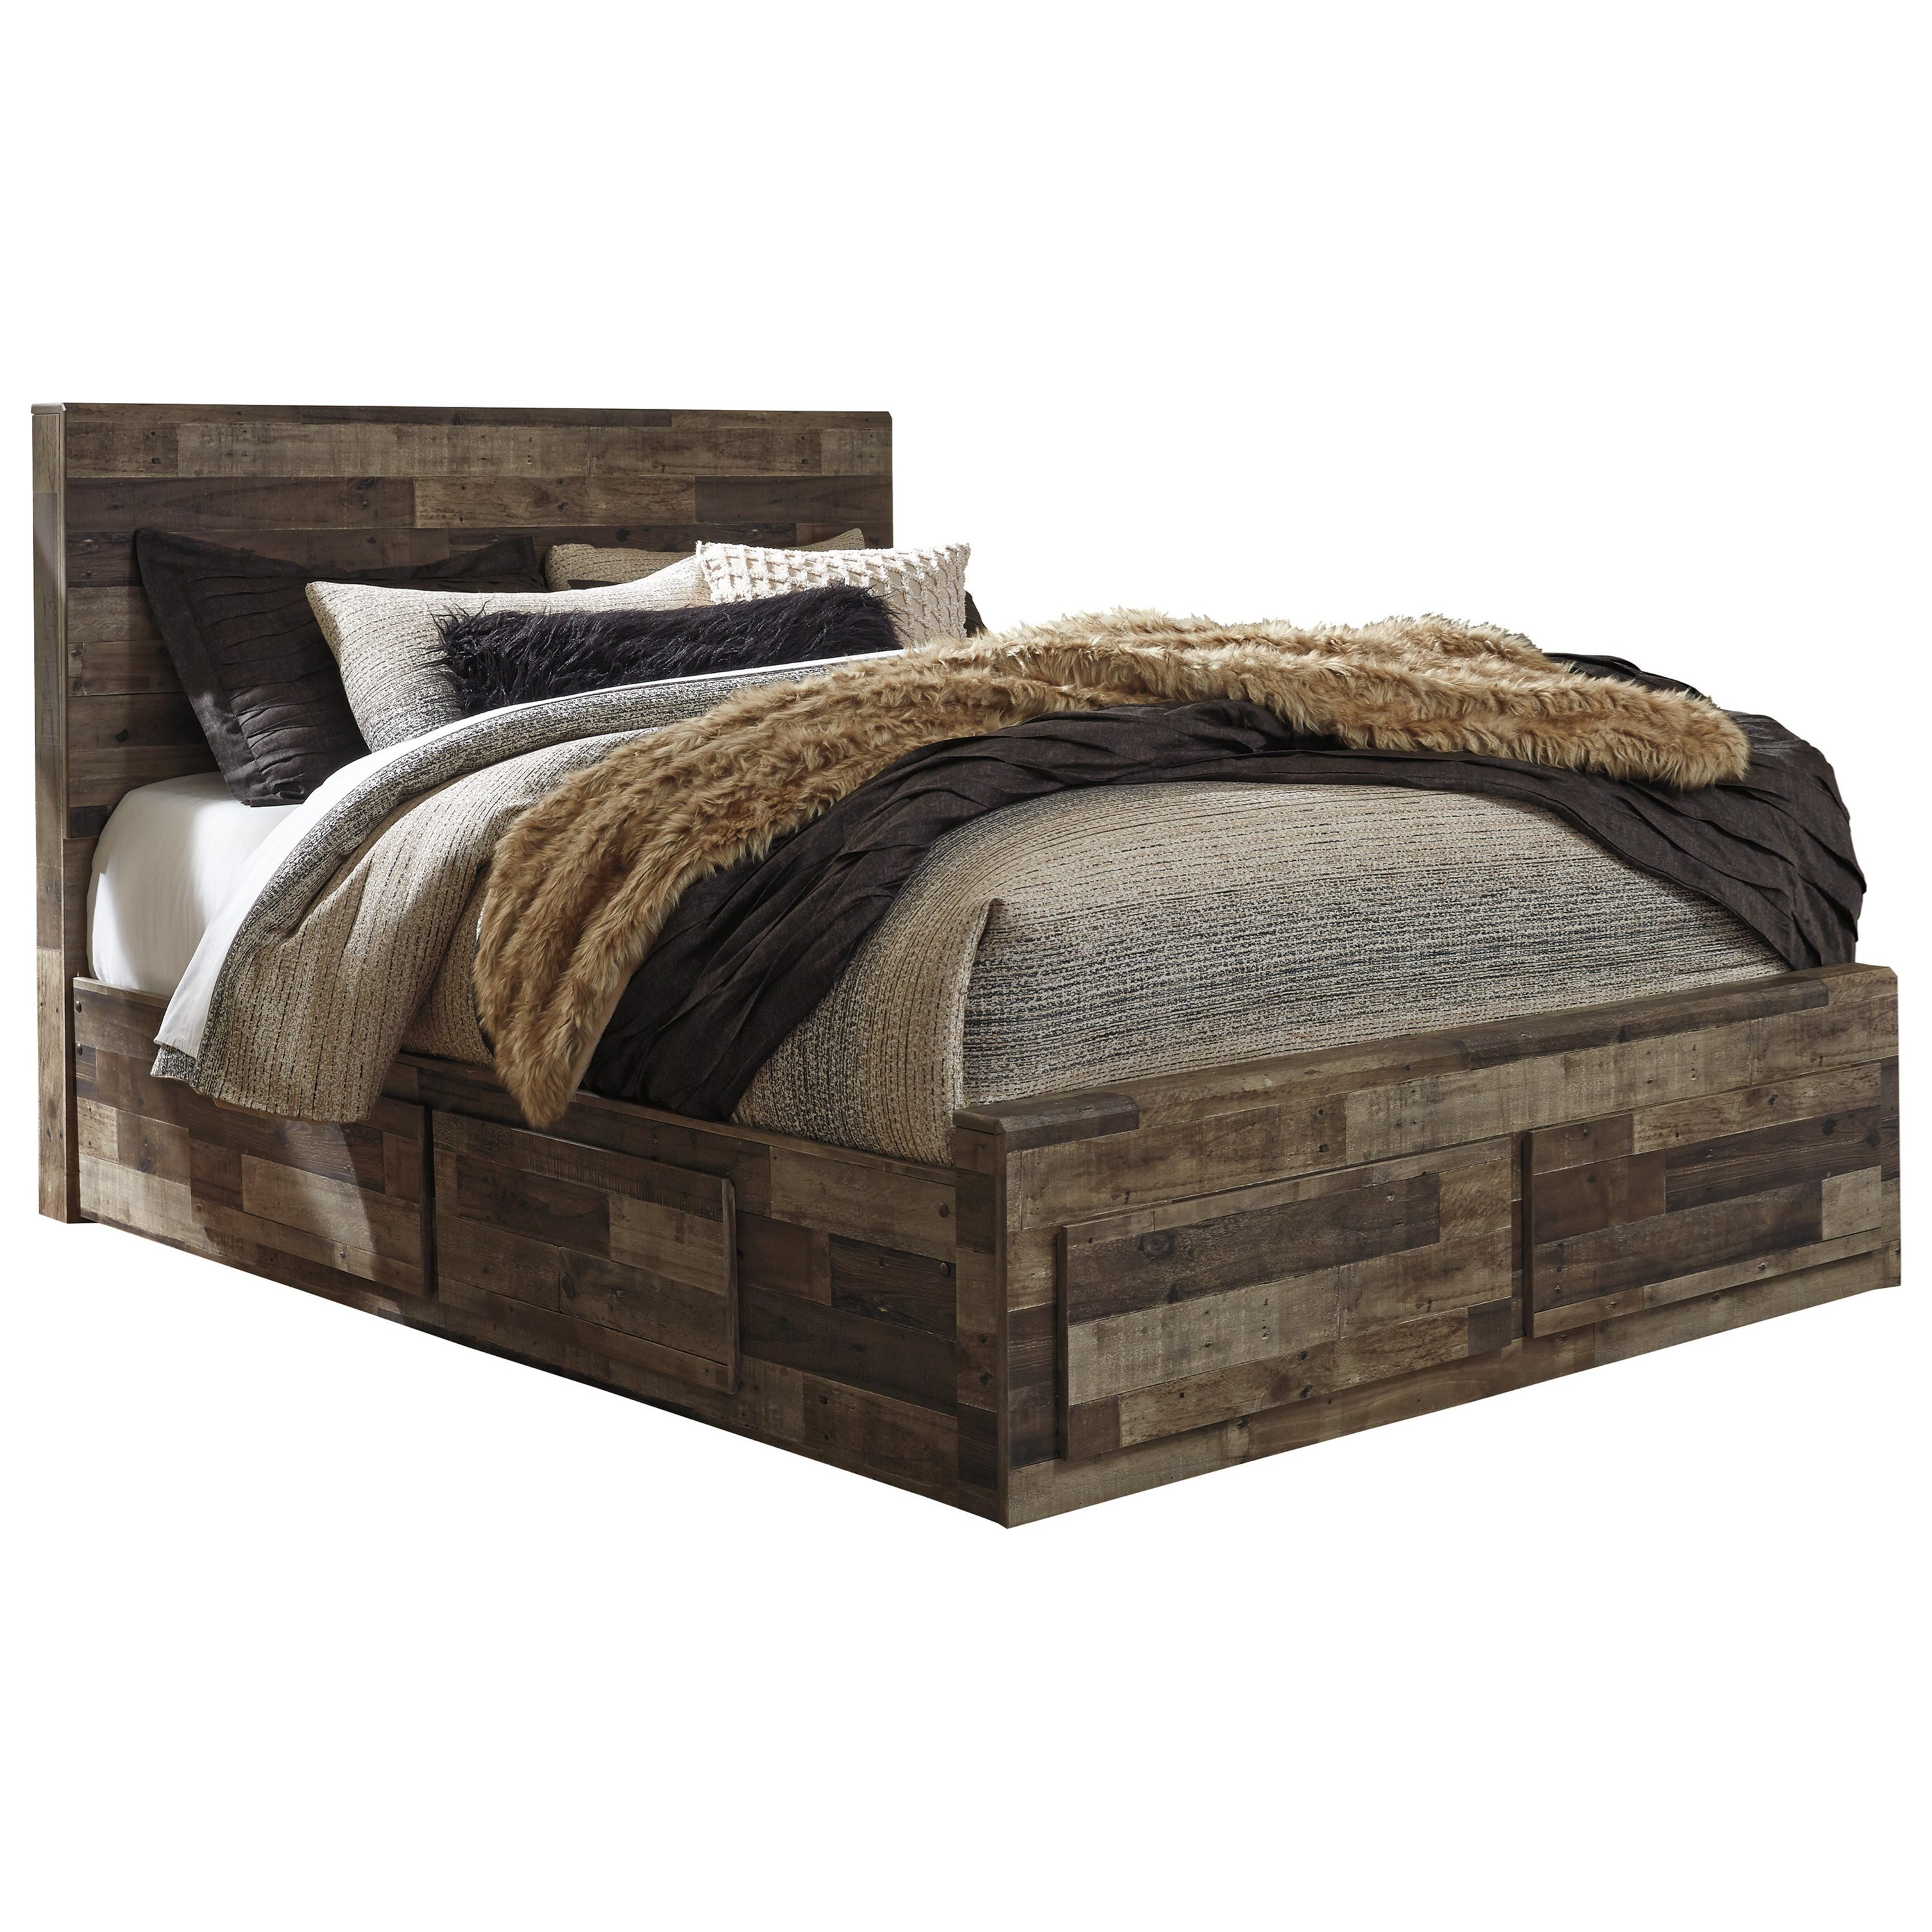 Derekson Queen Storage Bed with 6 Drawers by Benchcraft at Walker's Furniture